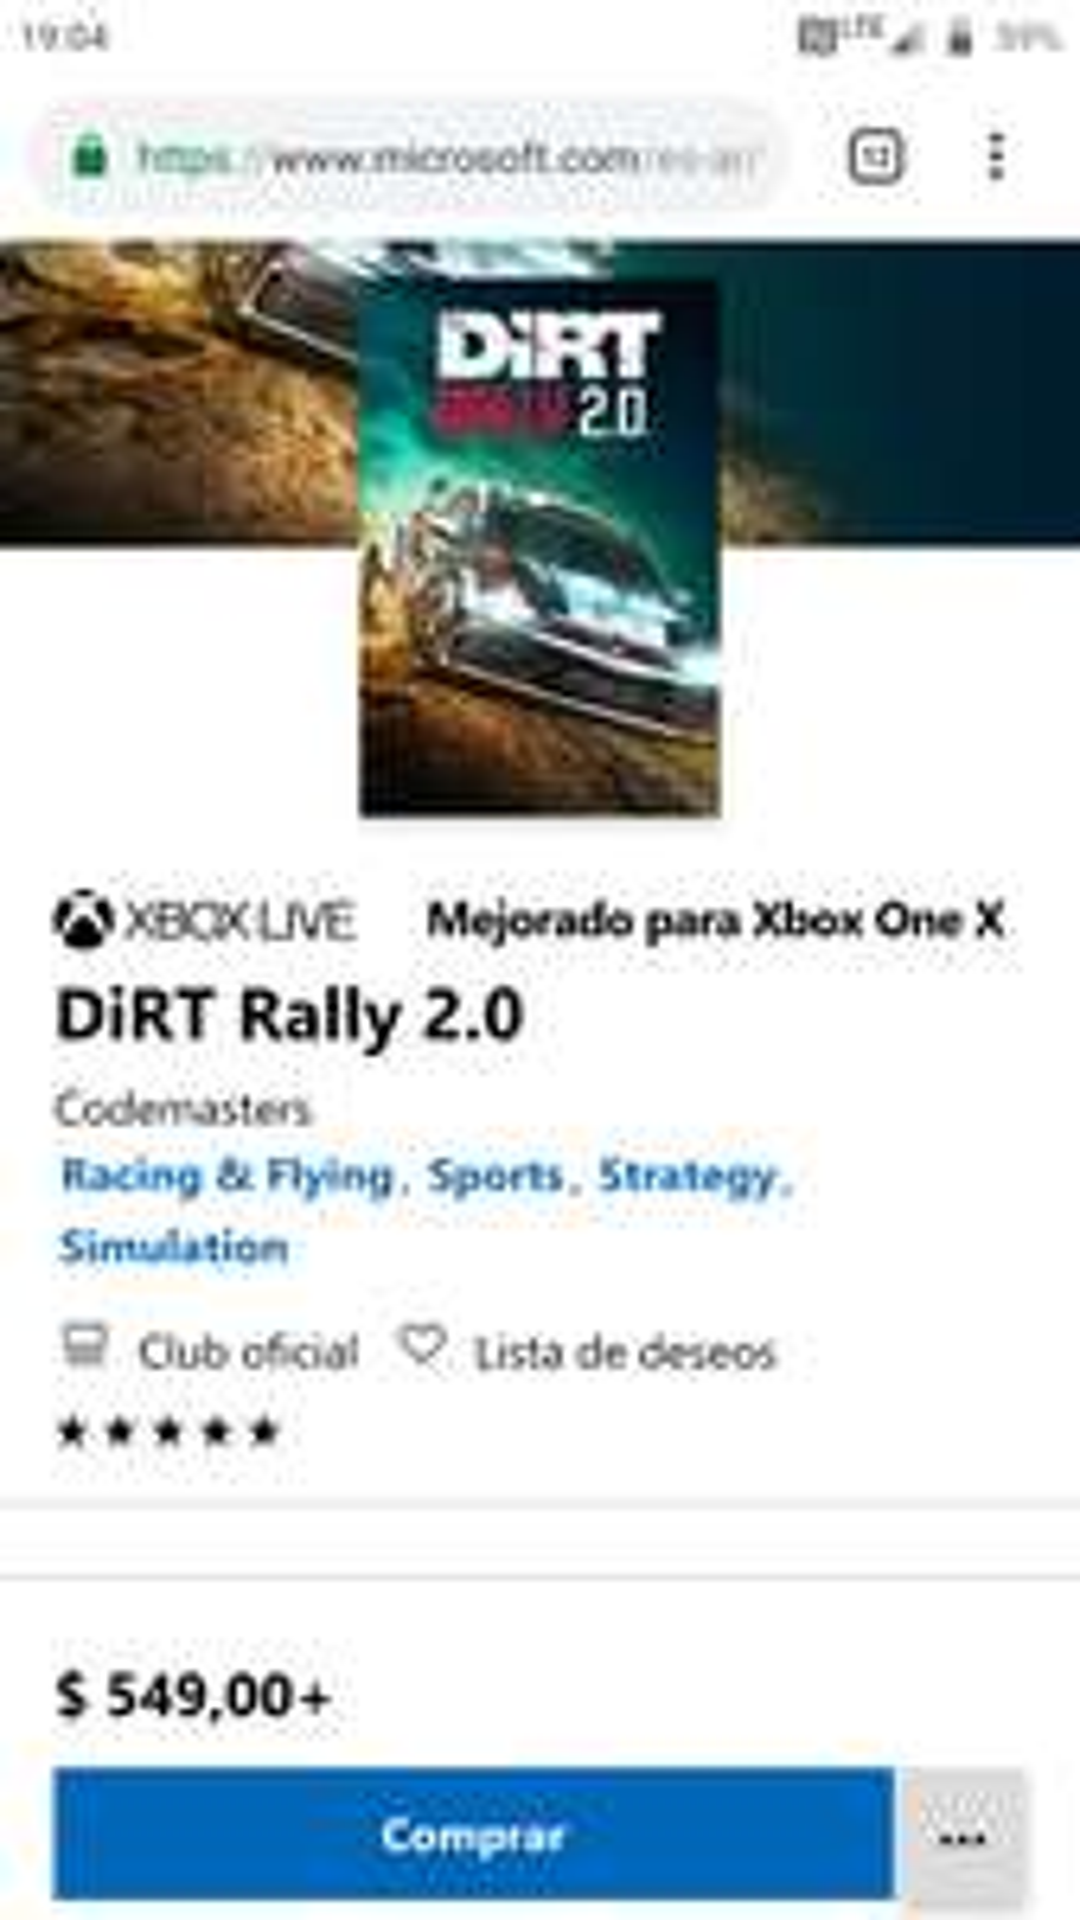 Gra xbox one Dirt rally 2.0 ms store Argentyna revolut 549 ARS